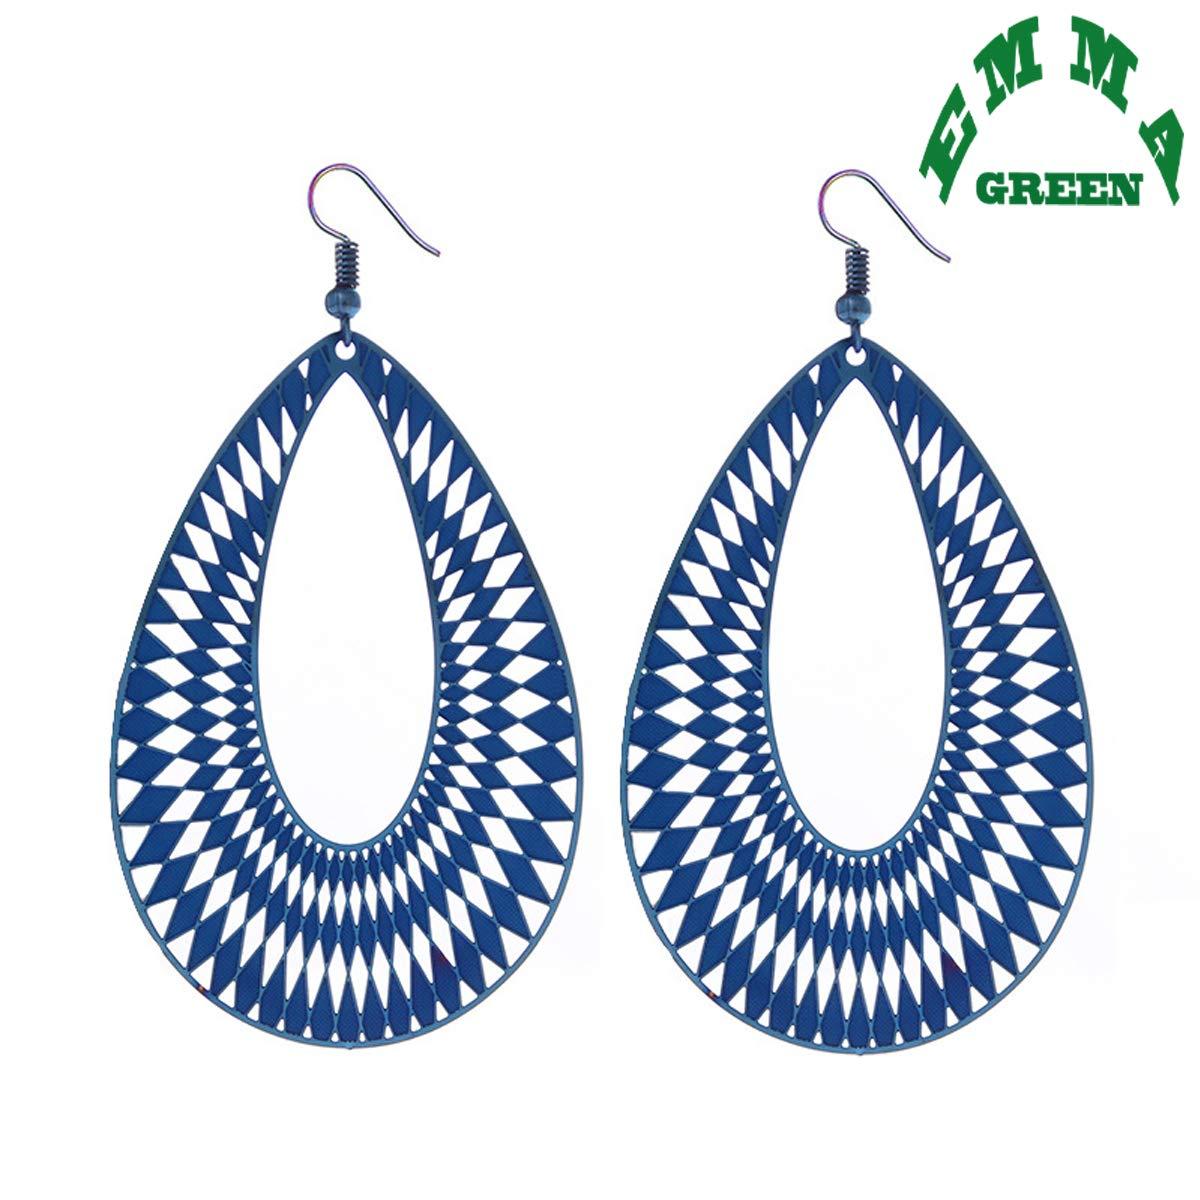 cf3b9e41f1c50 Amazon.com: EmmaGreen Lightweight Dangle Earrings Simple Earrings ...